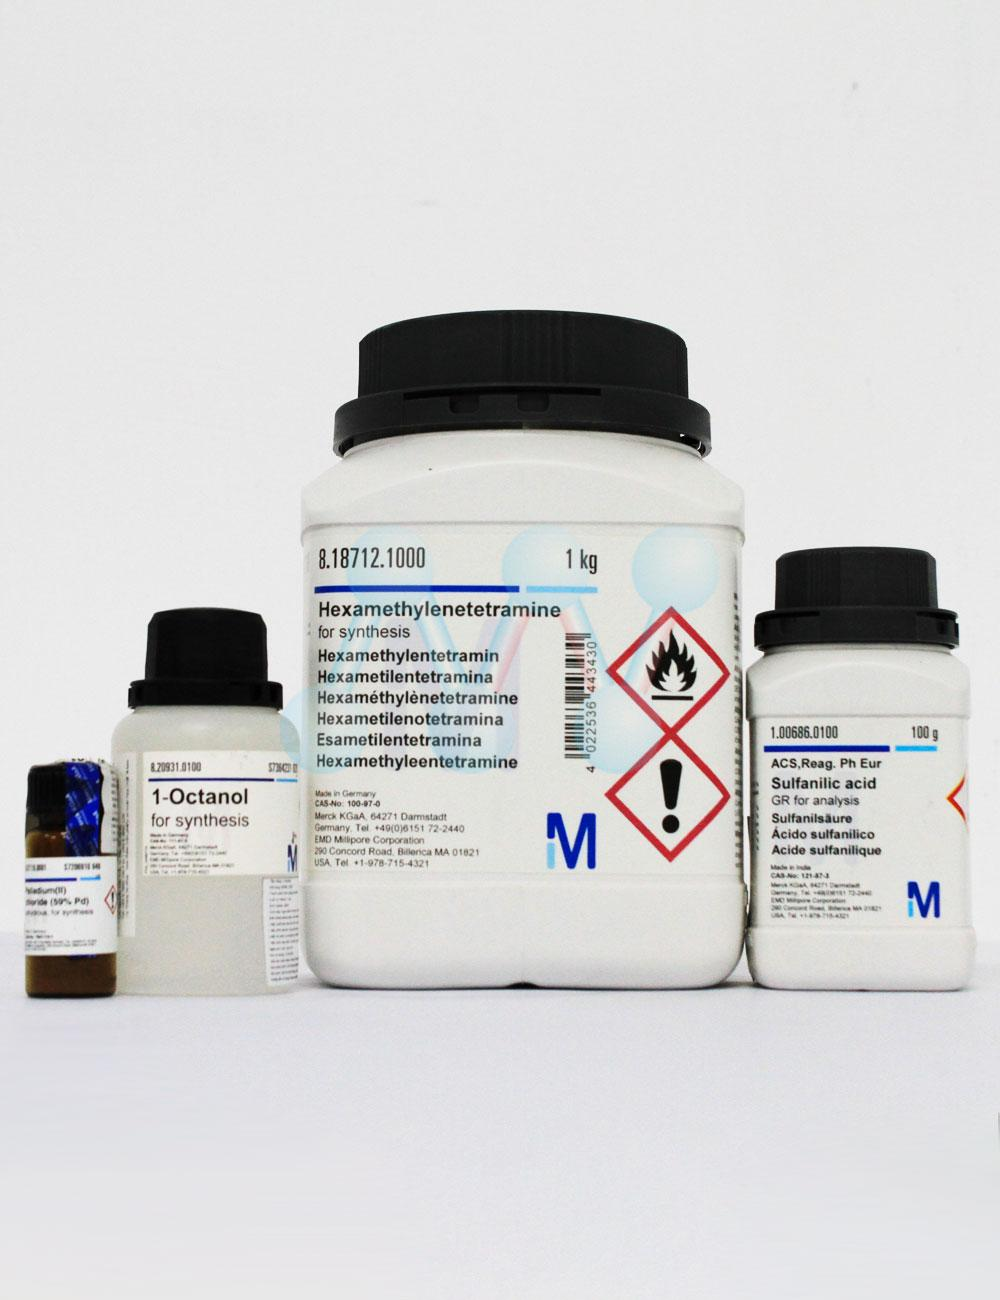 Potassium tert butylate for synthesis